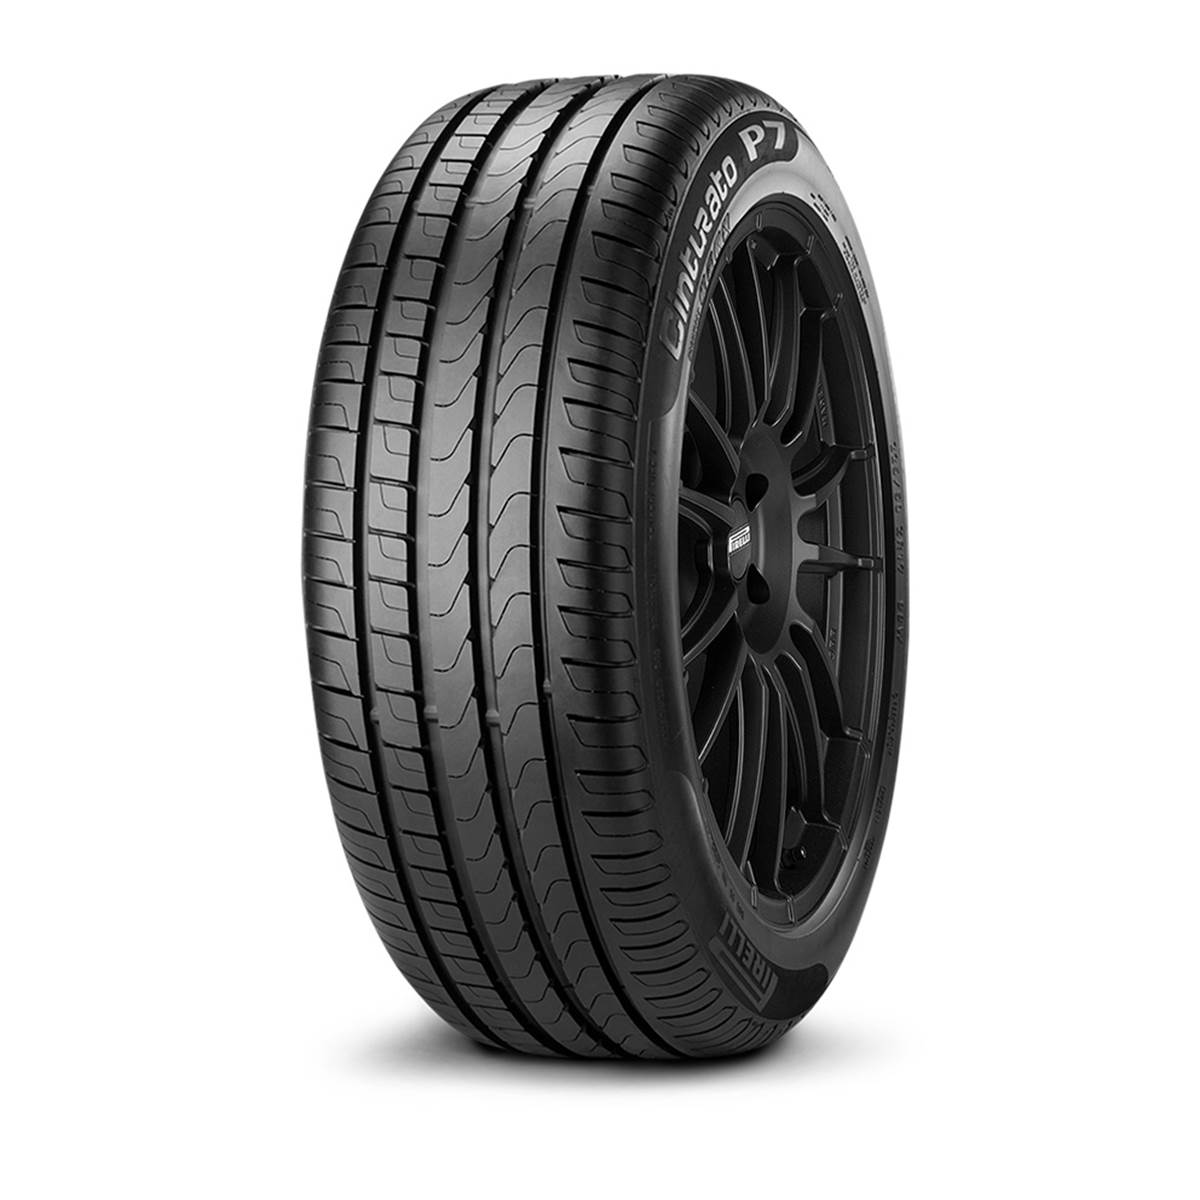 Pneu Pirelli 235/40R19 92V Cinturato P7